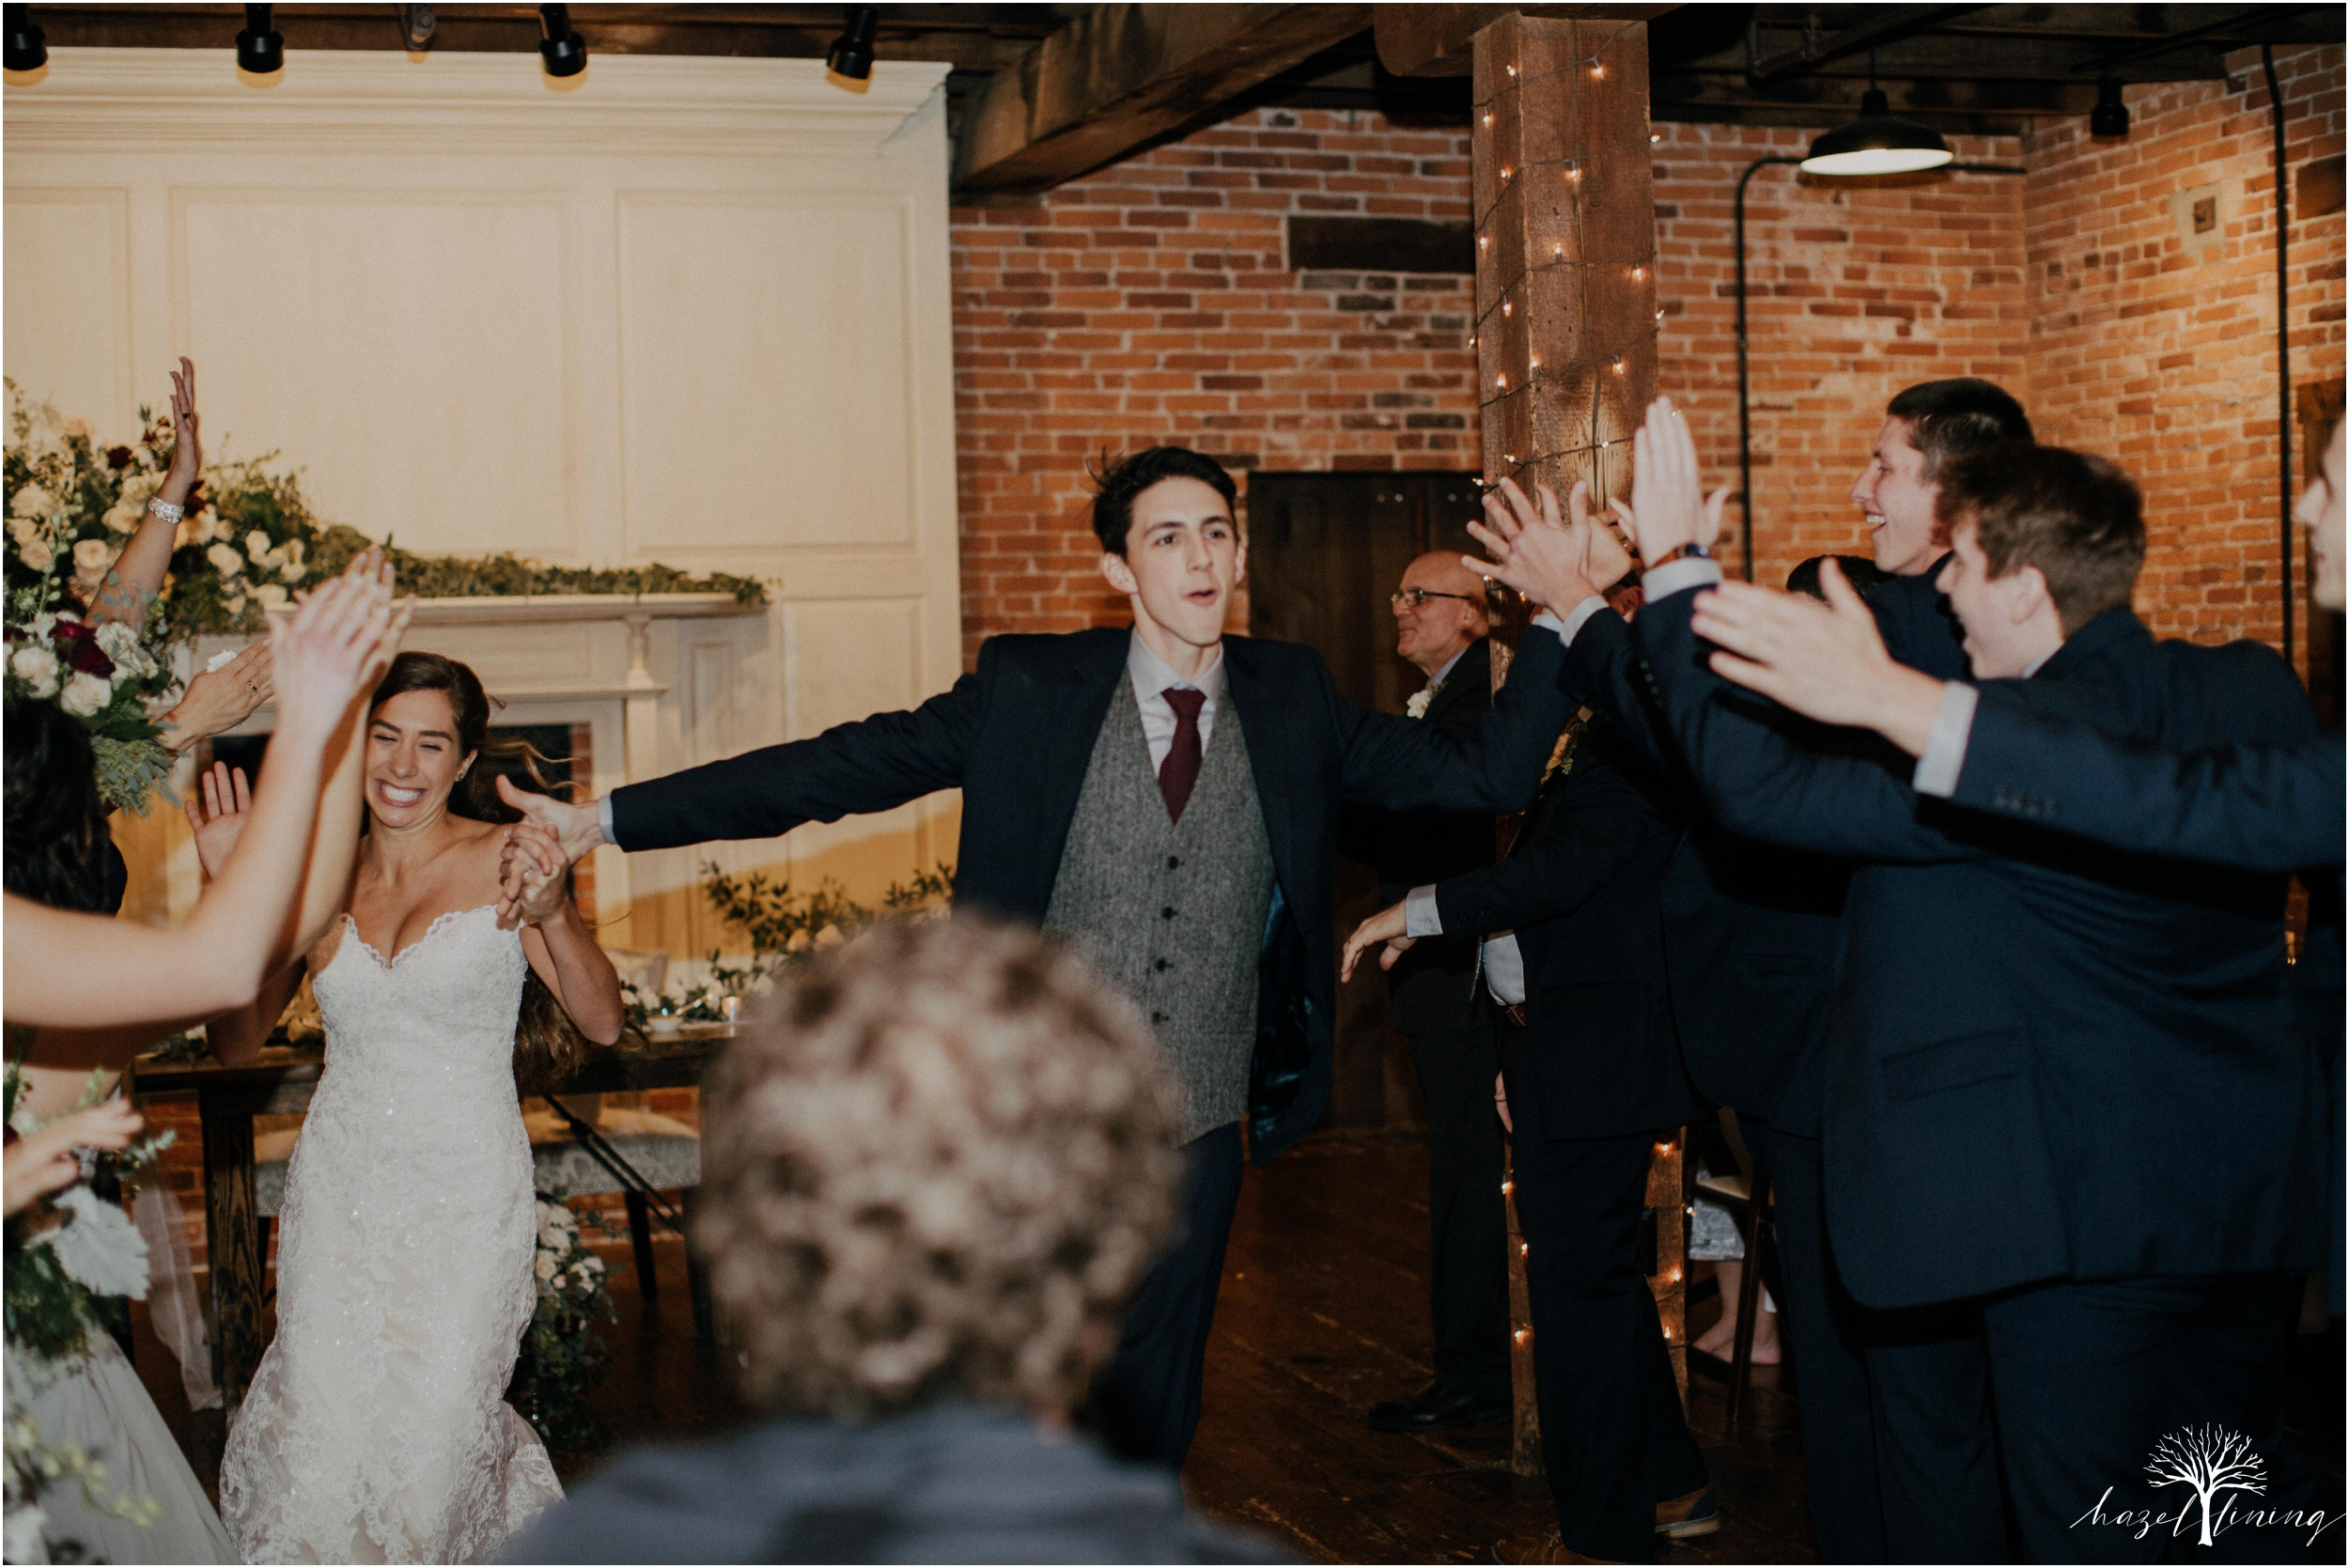 emma-matt-gehringer-the-booking-house-lancaster-manhiem-pennsylvania-winter-wedding_0138.jpg